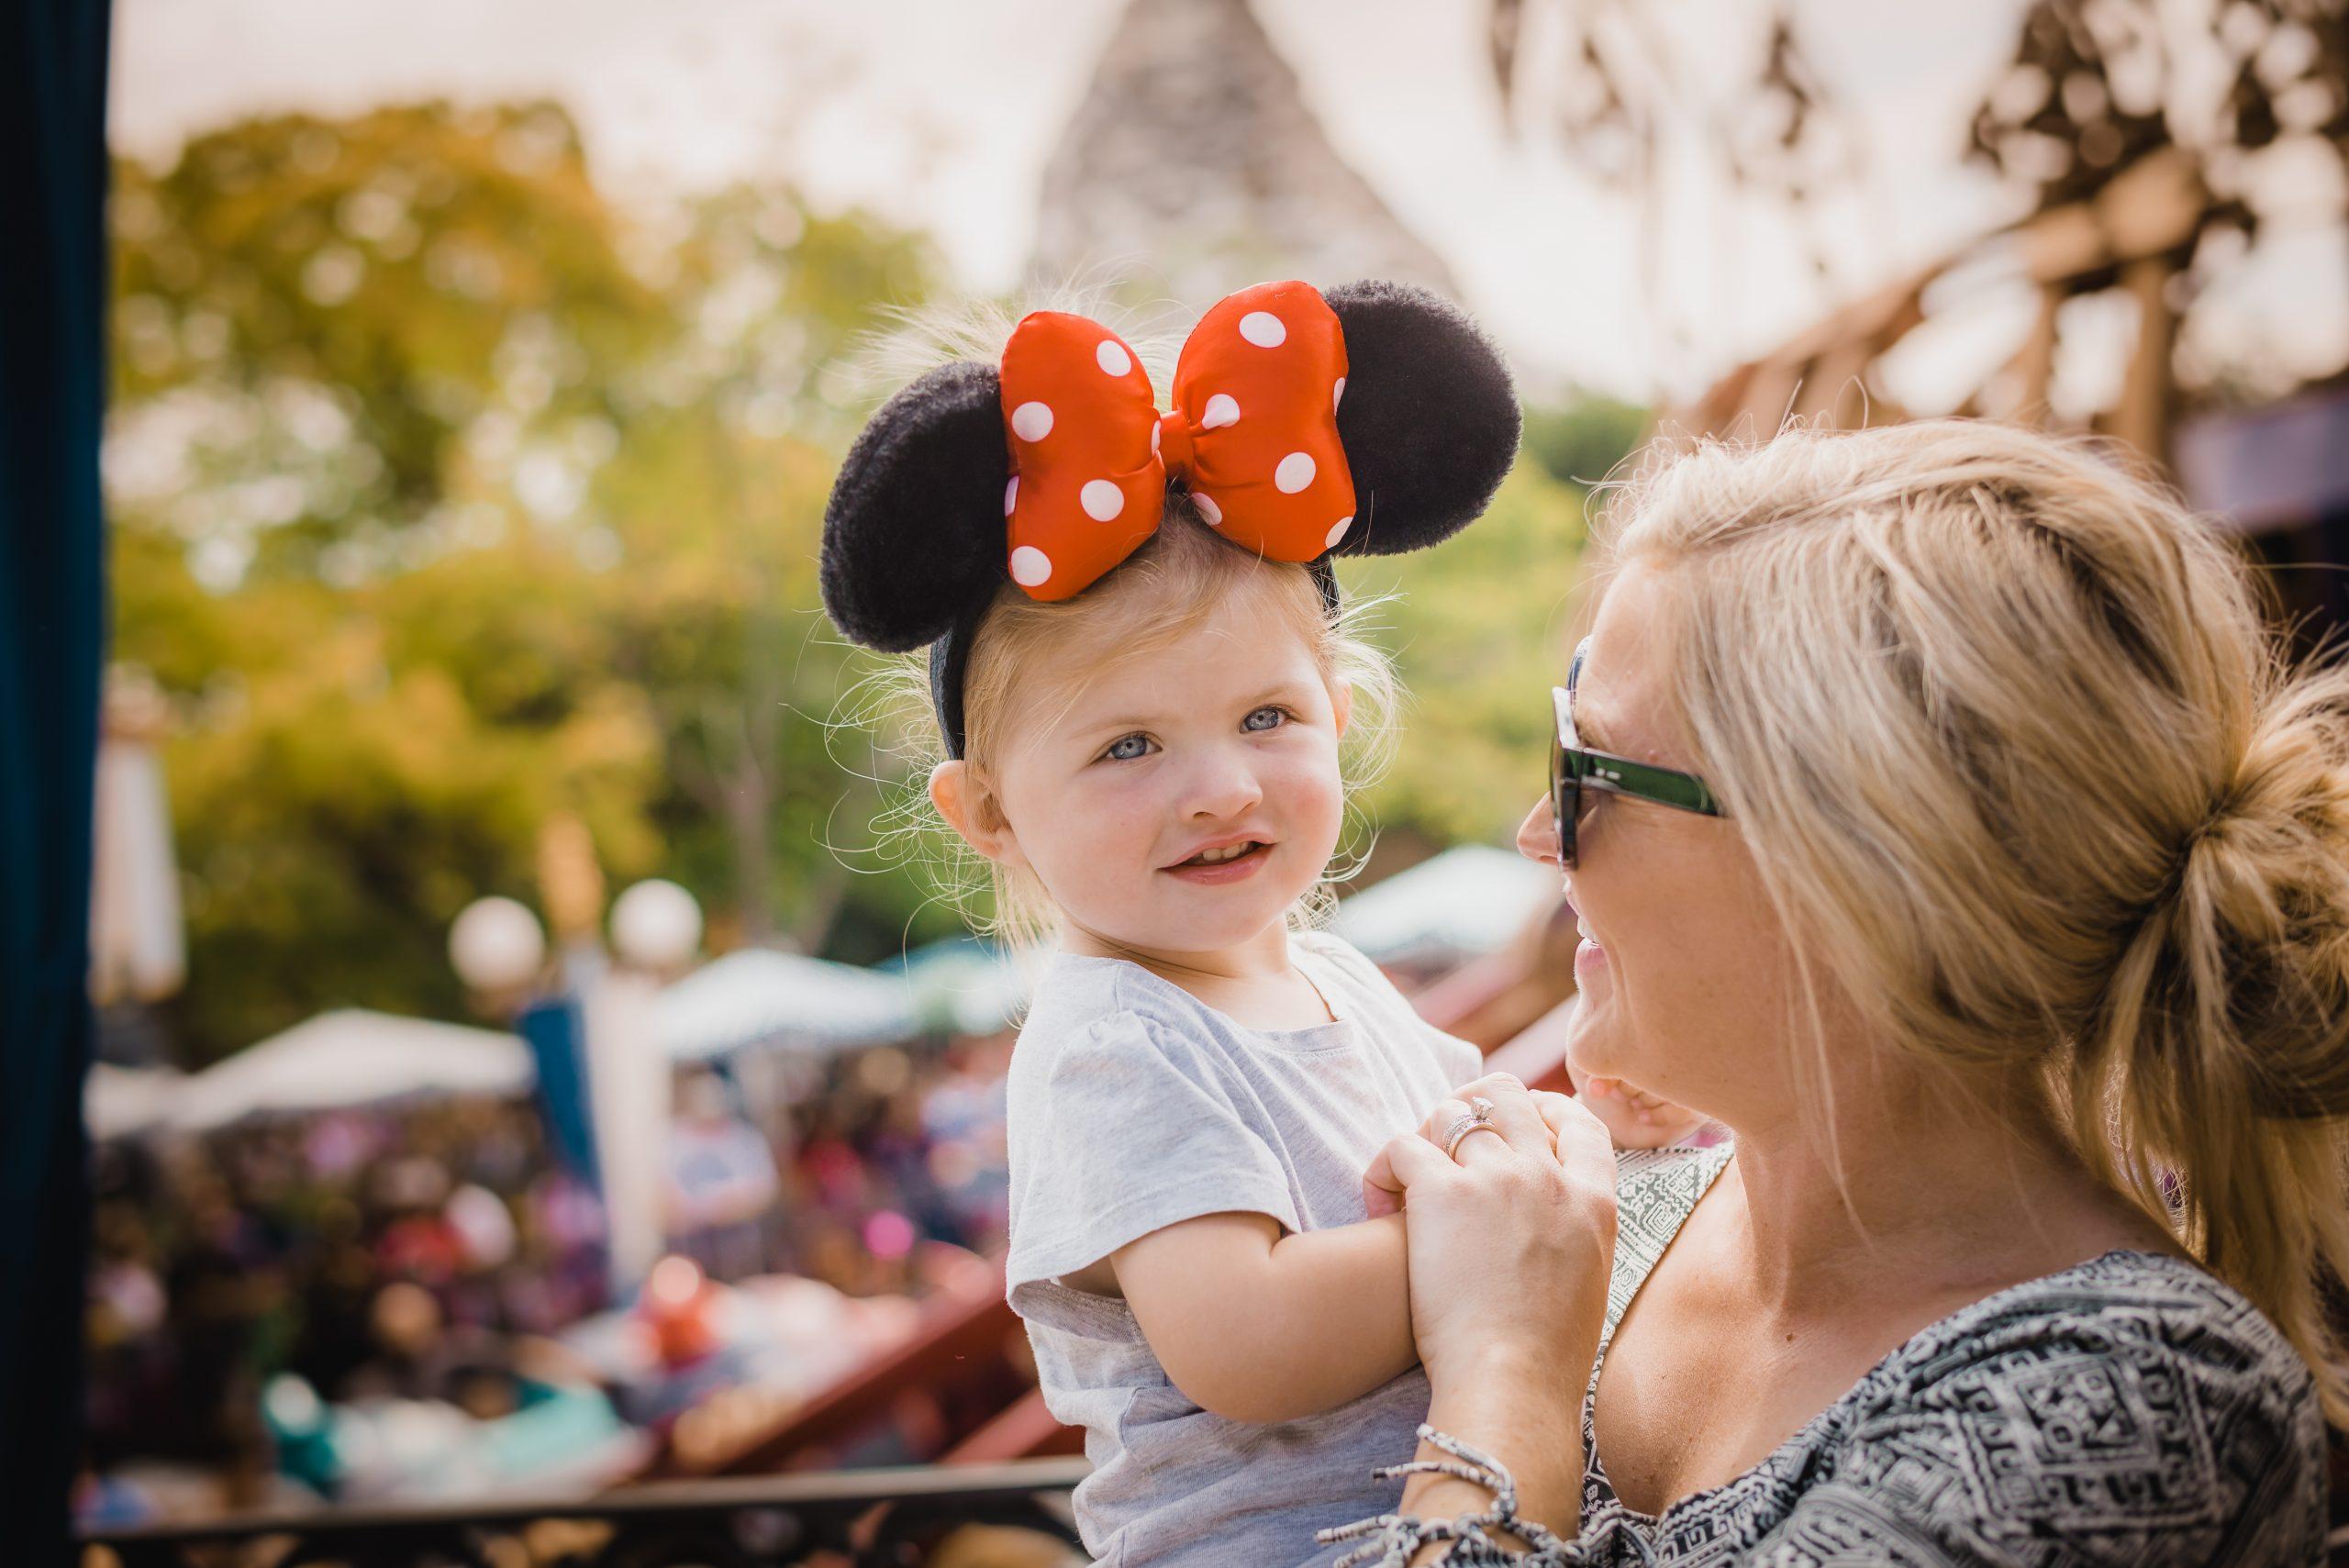 Little girls smiling at Disneyland